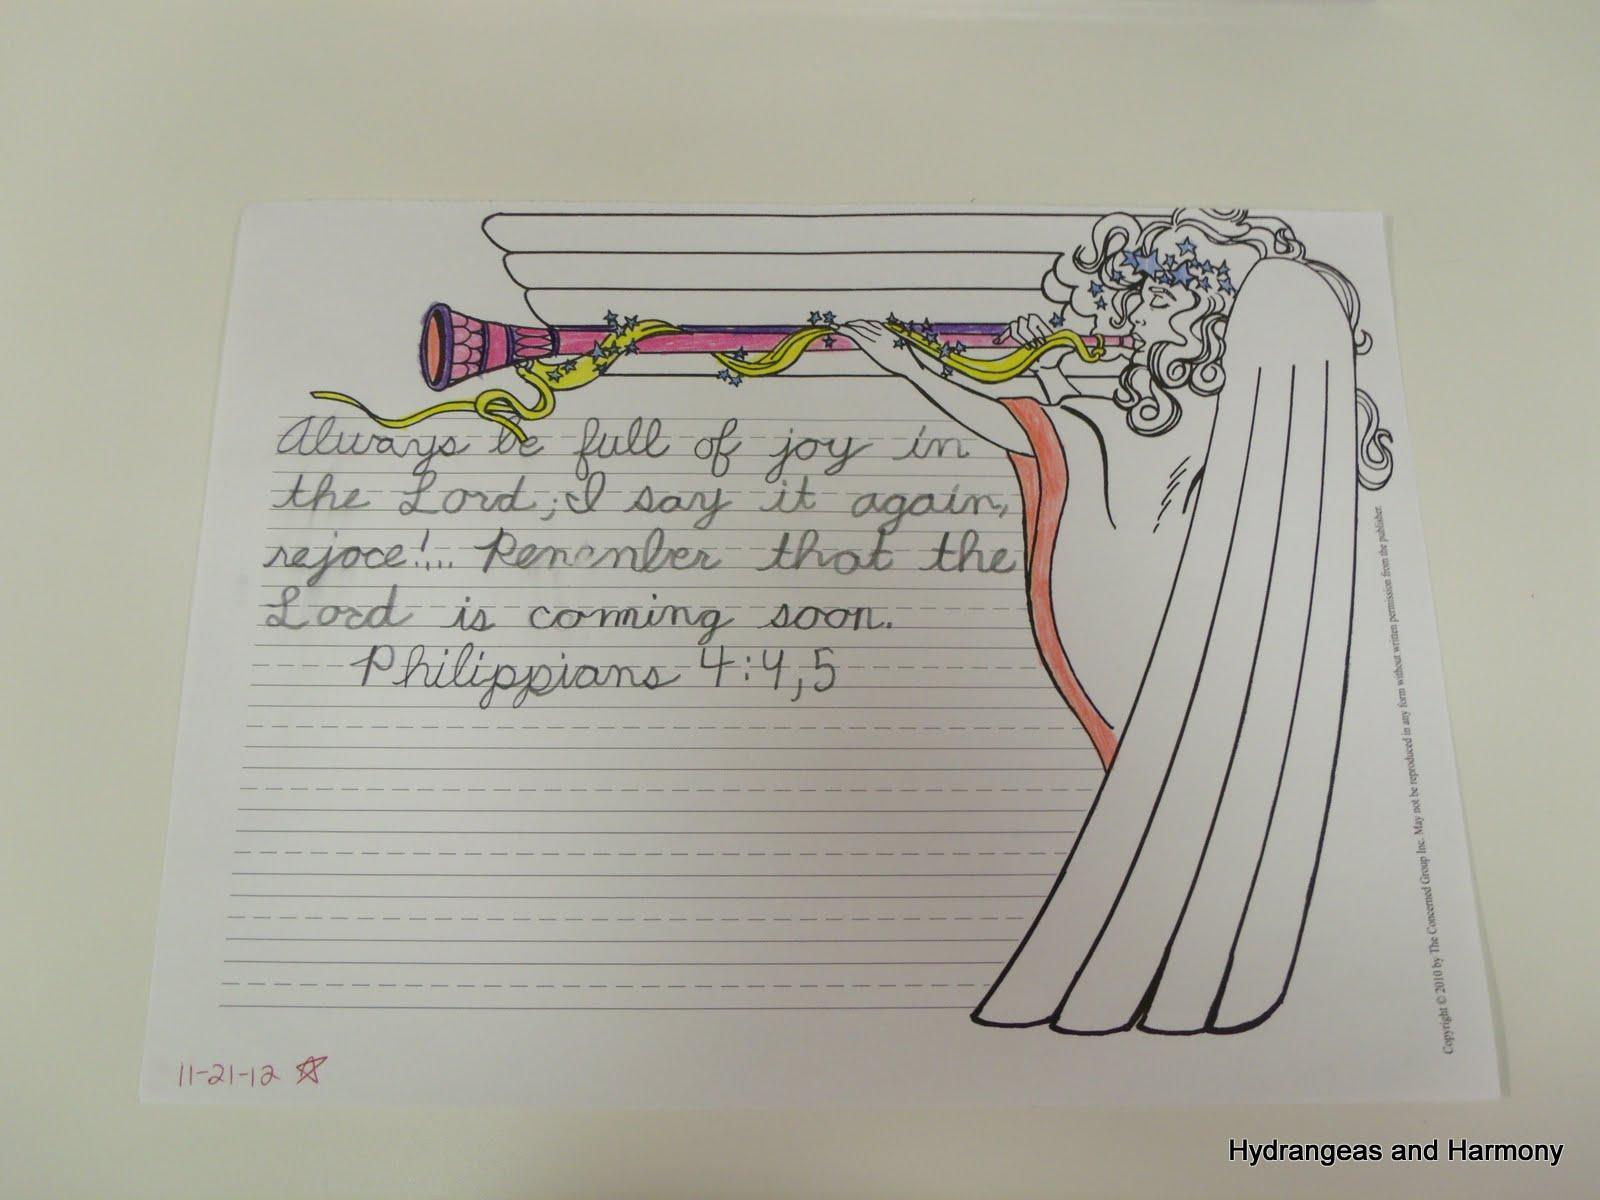 Hydrangeas And Harmony School Days Summary The 10 Plagues Of Egypt